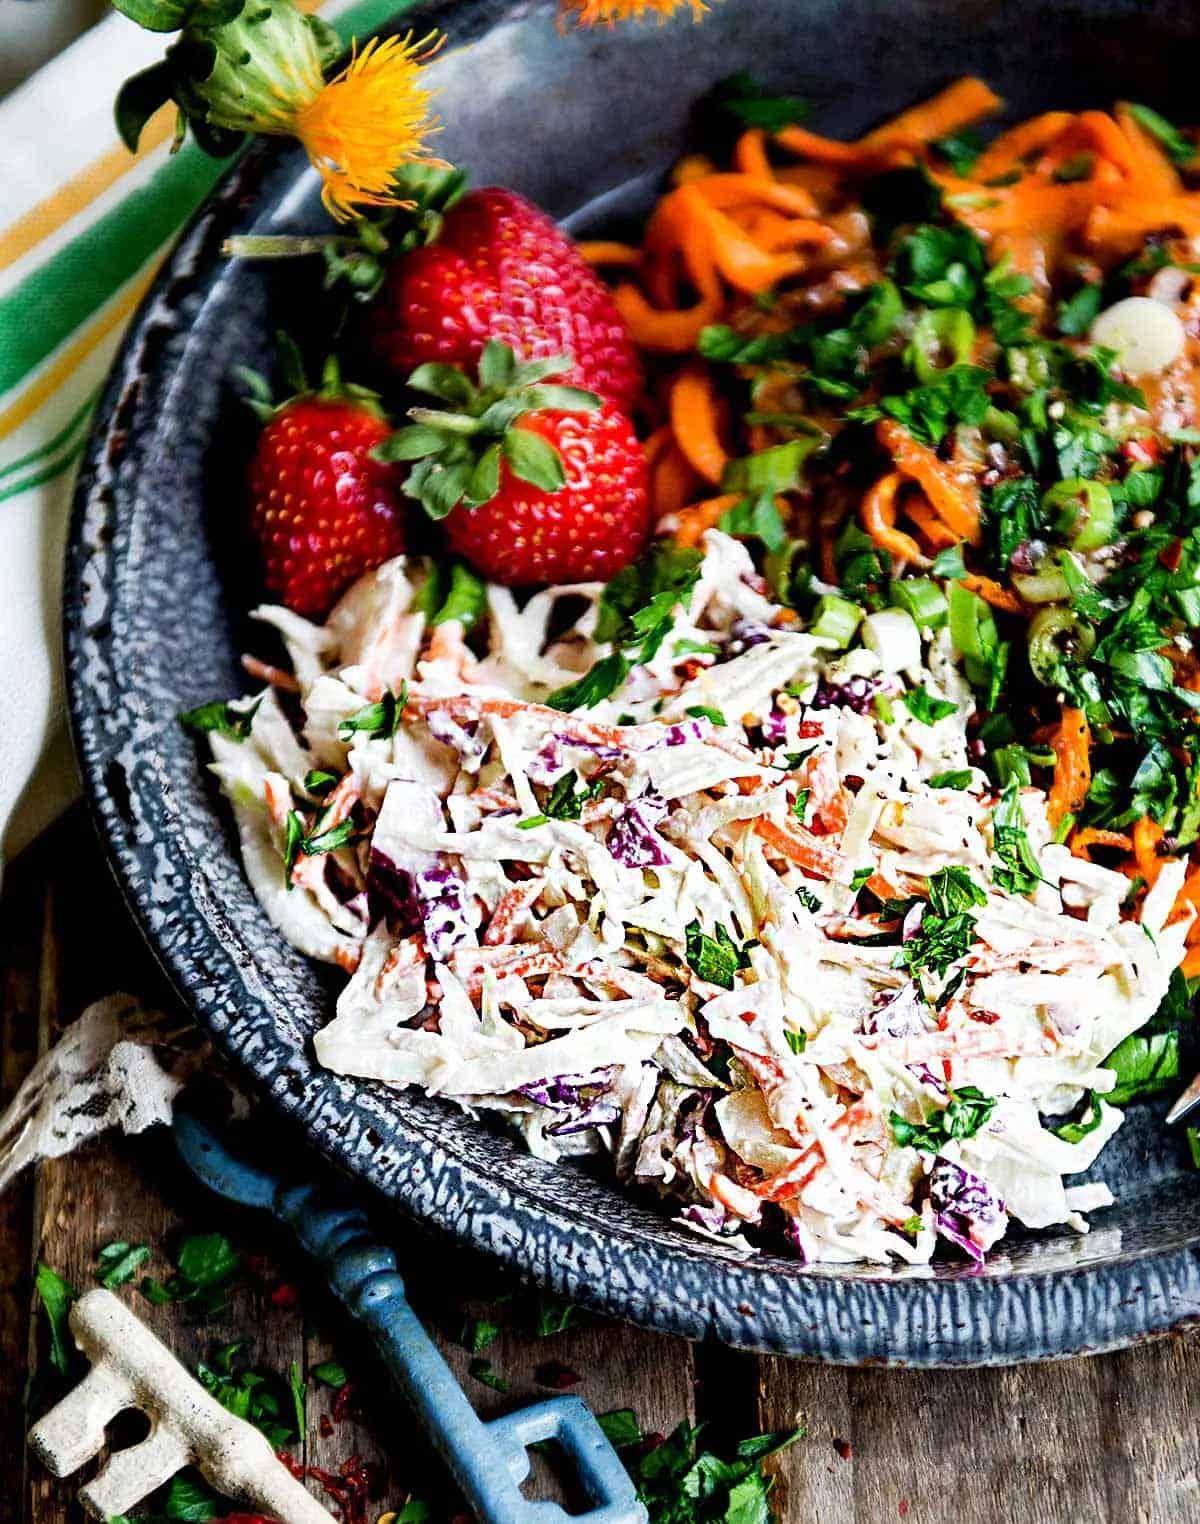 Homemade vegan coleslaw recipe